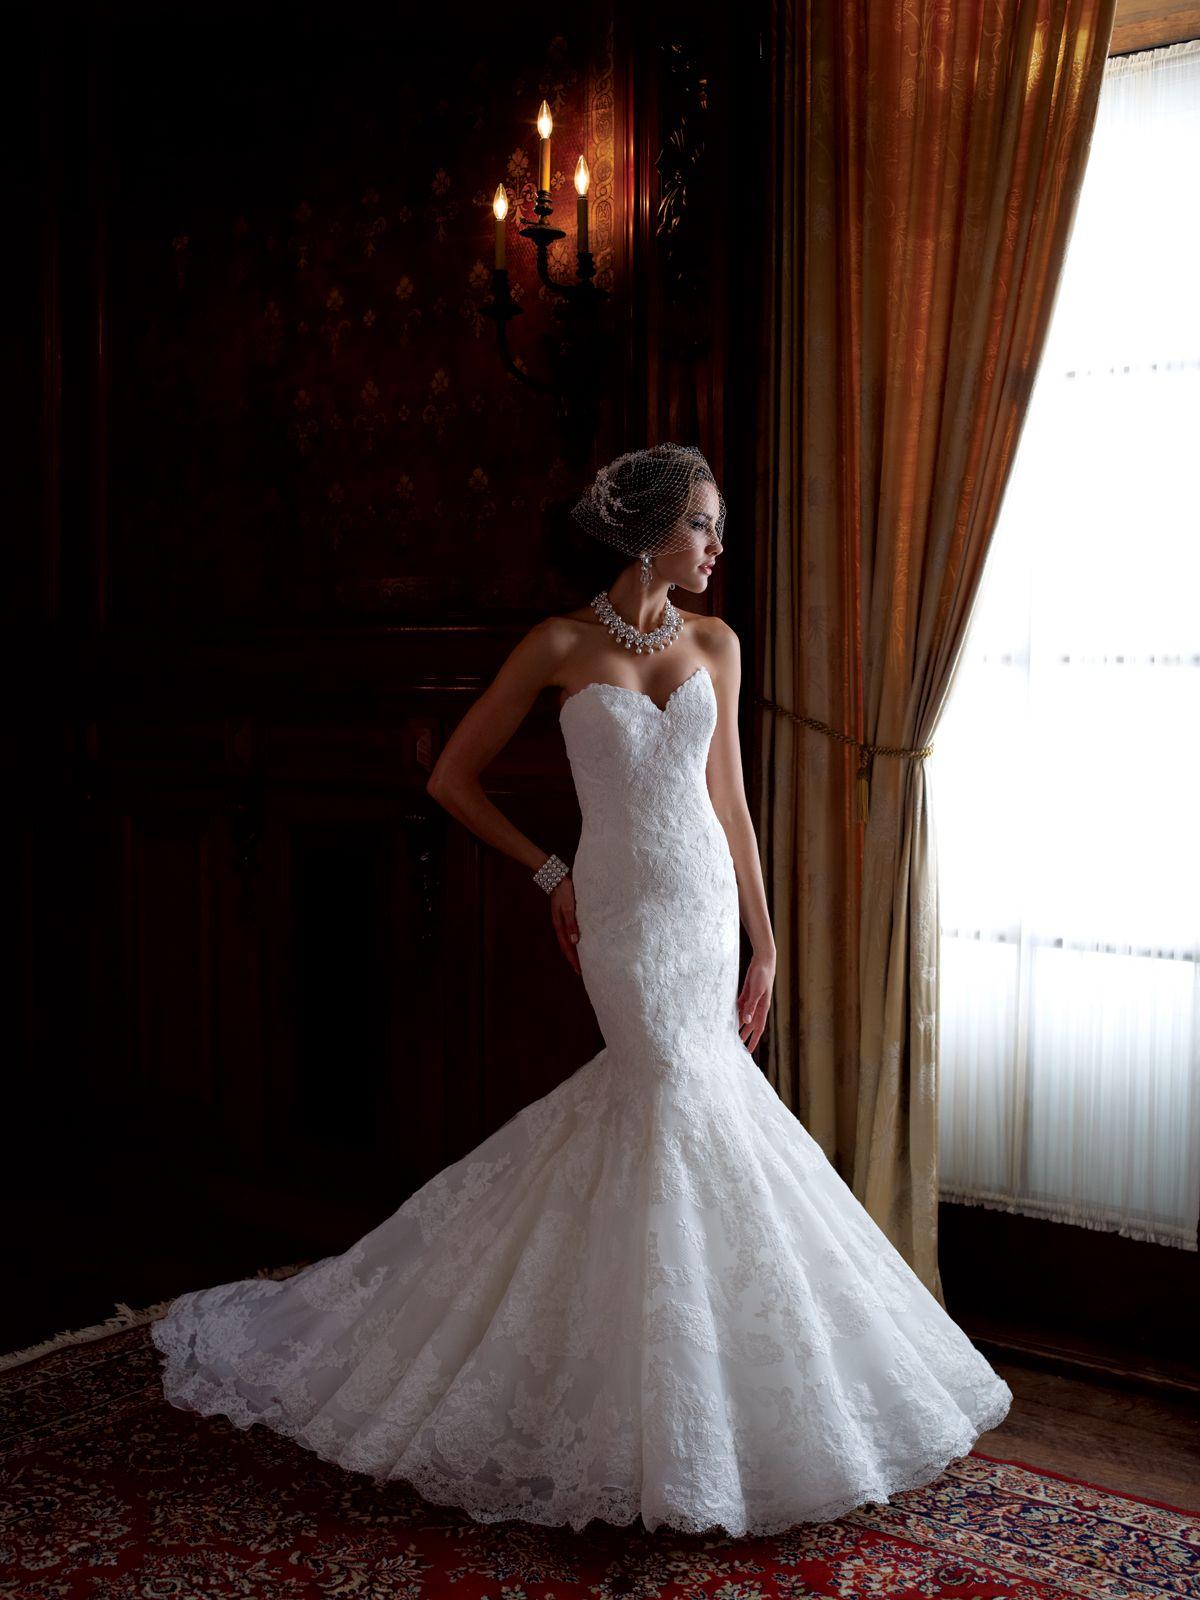 Pin by julia linde on wedding bliss pinterest flared skirt